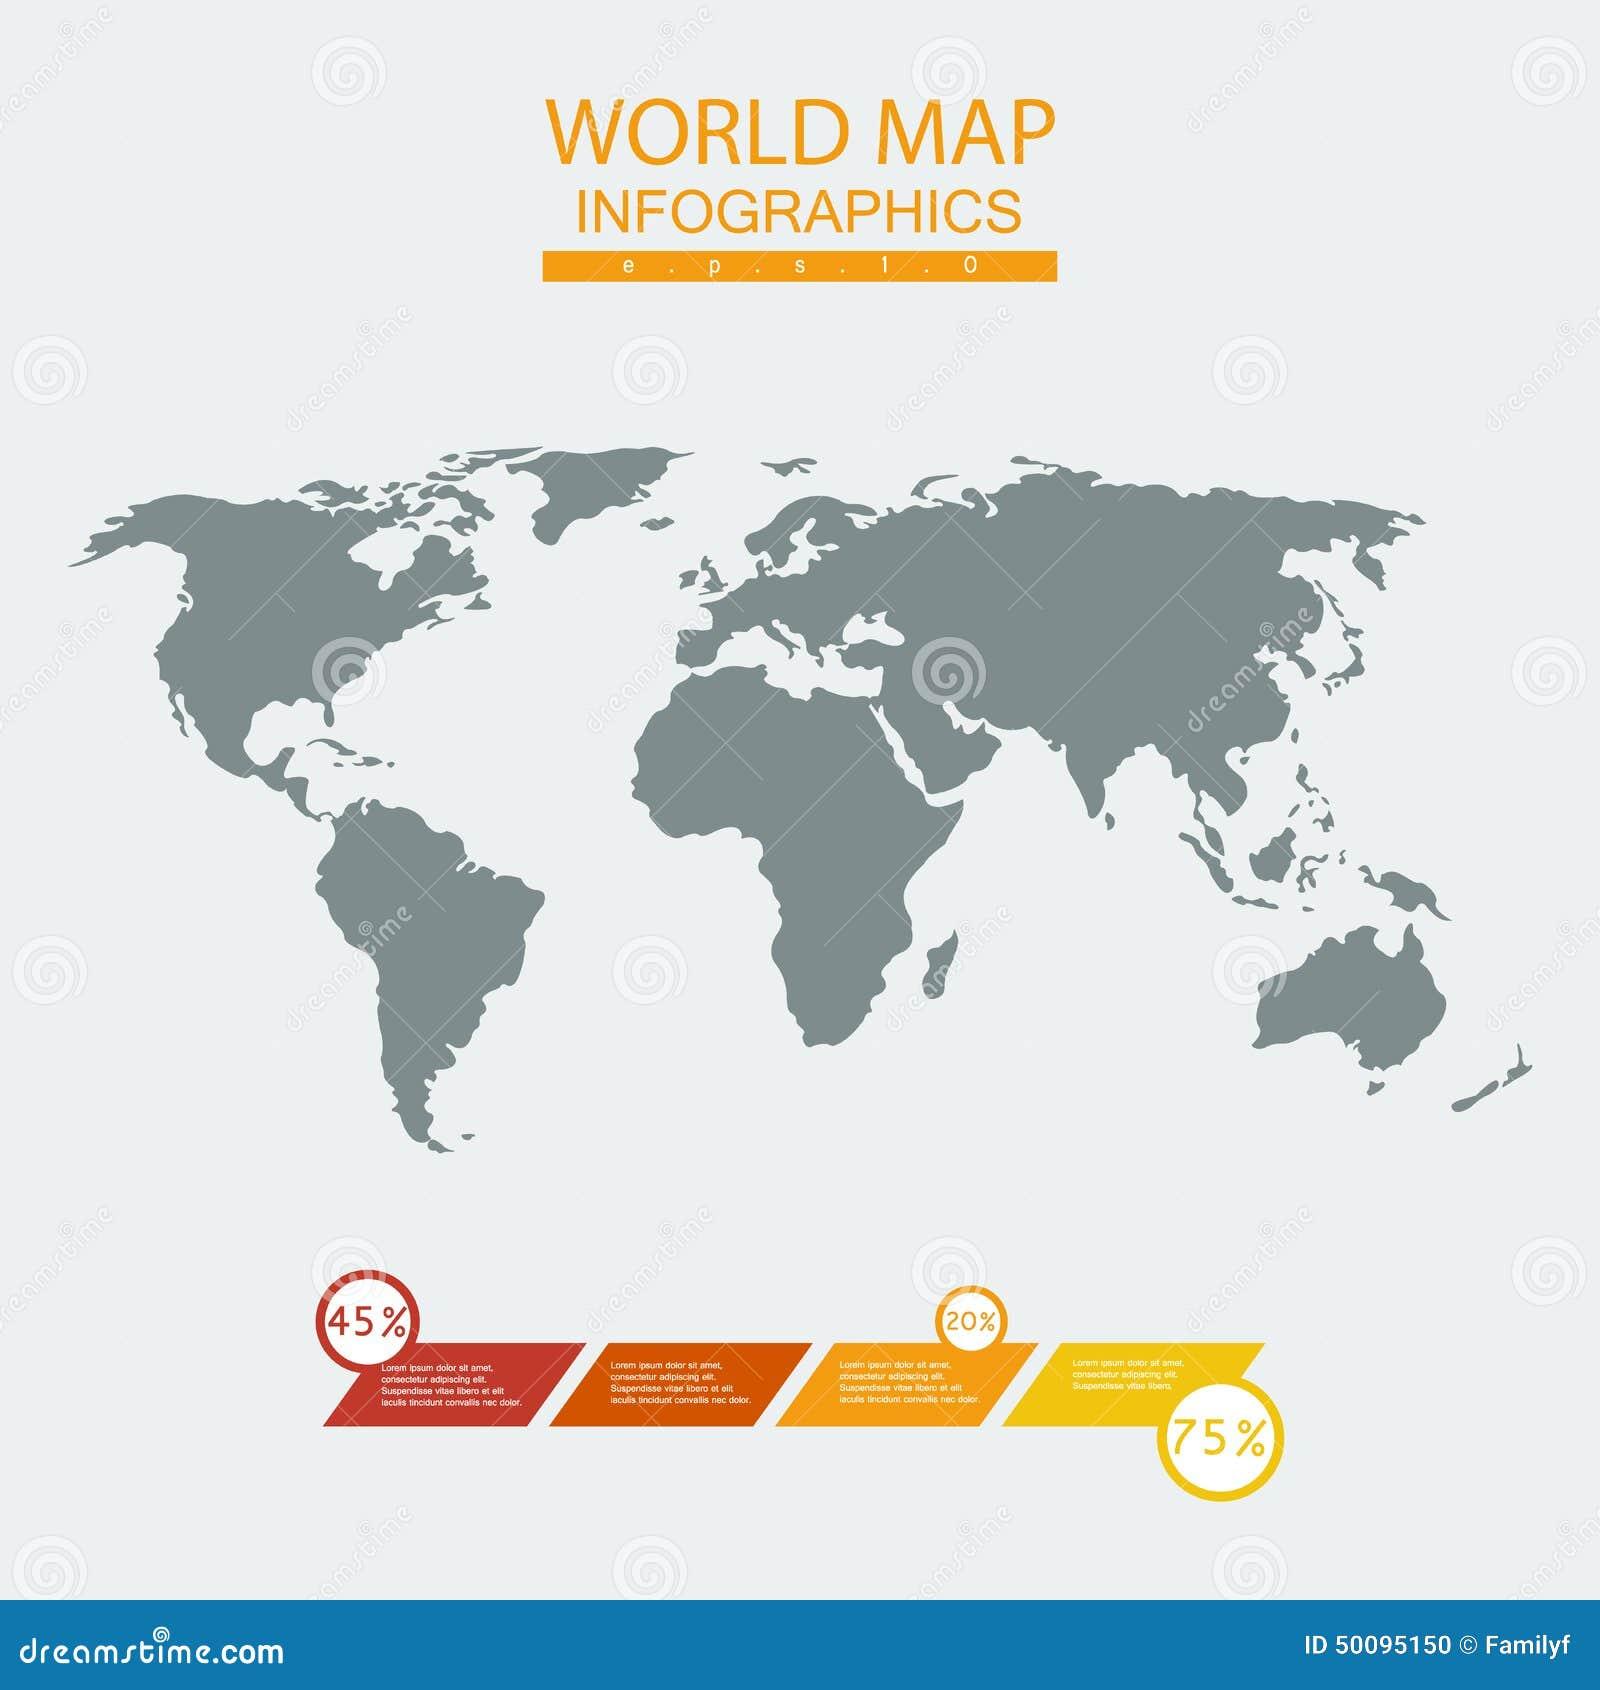 Vector World Map Chart Stock Vector Illustration Of Abstract - Mapchart